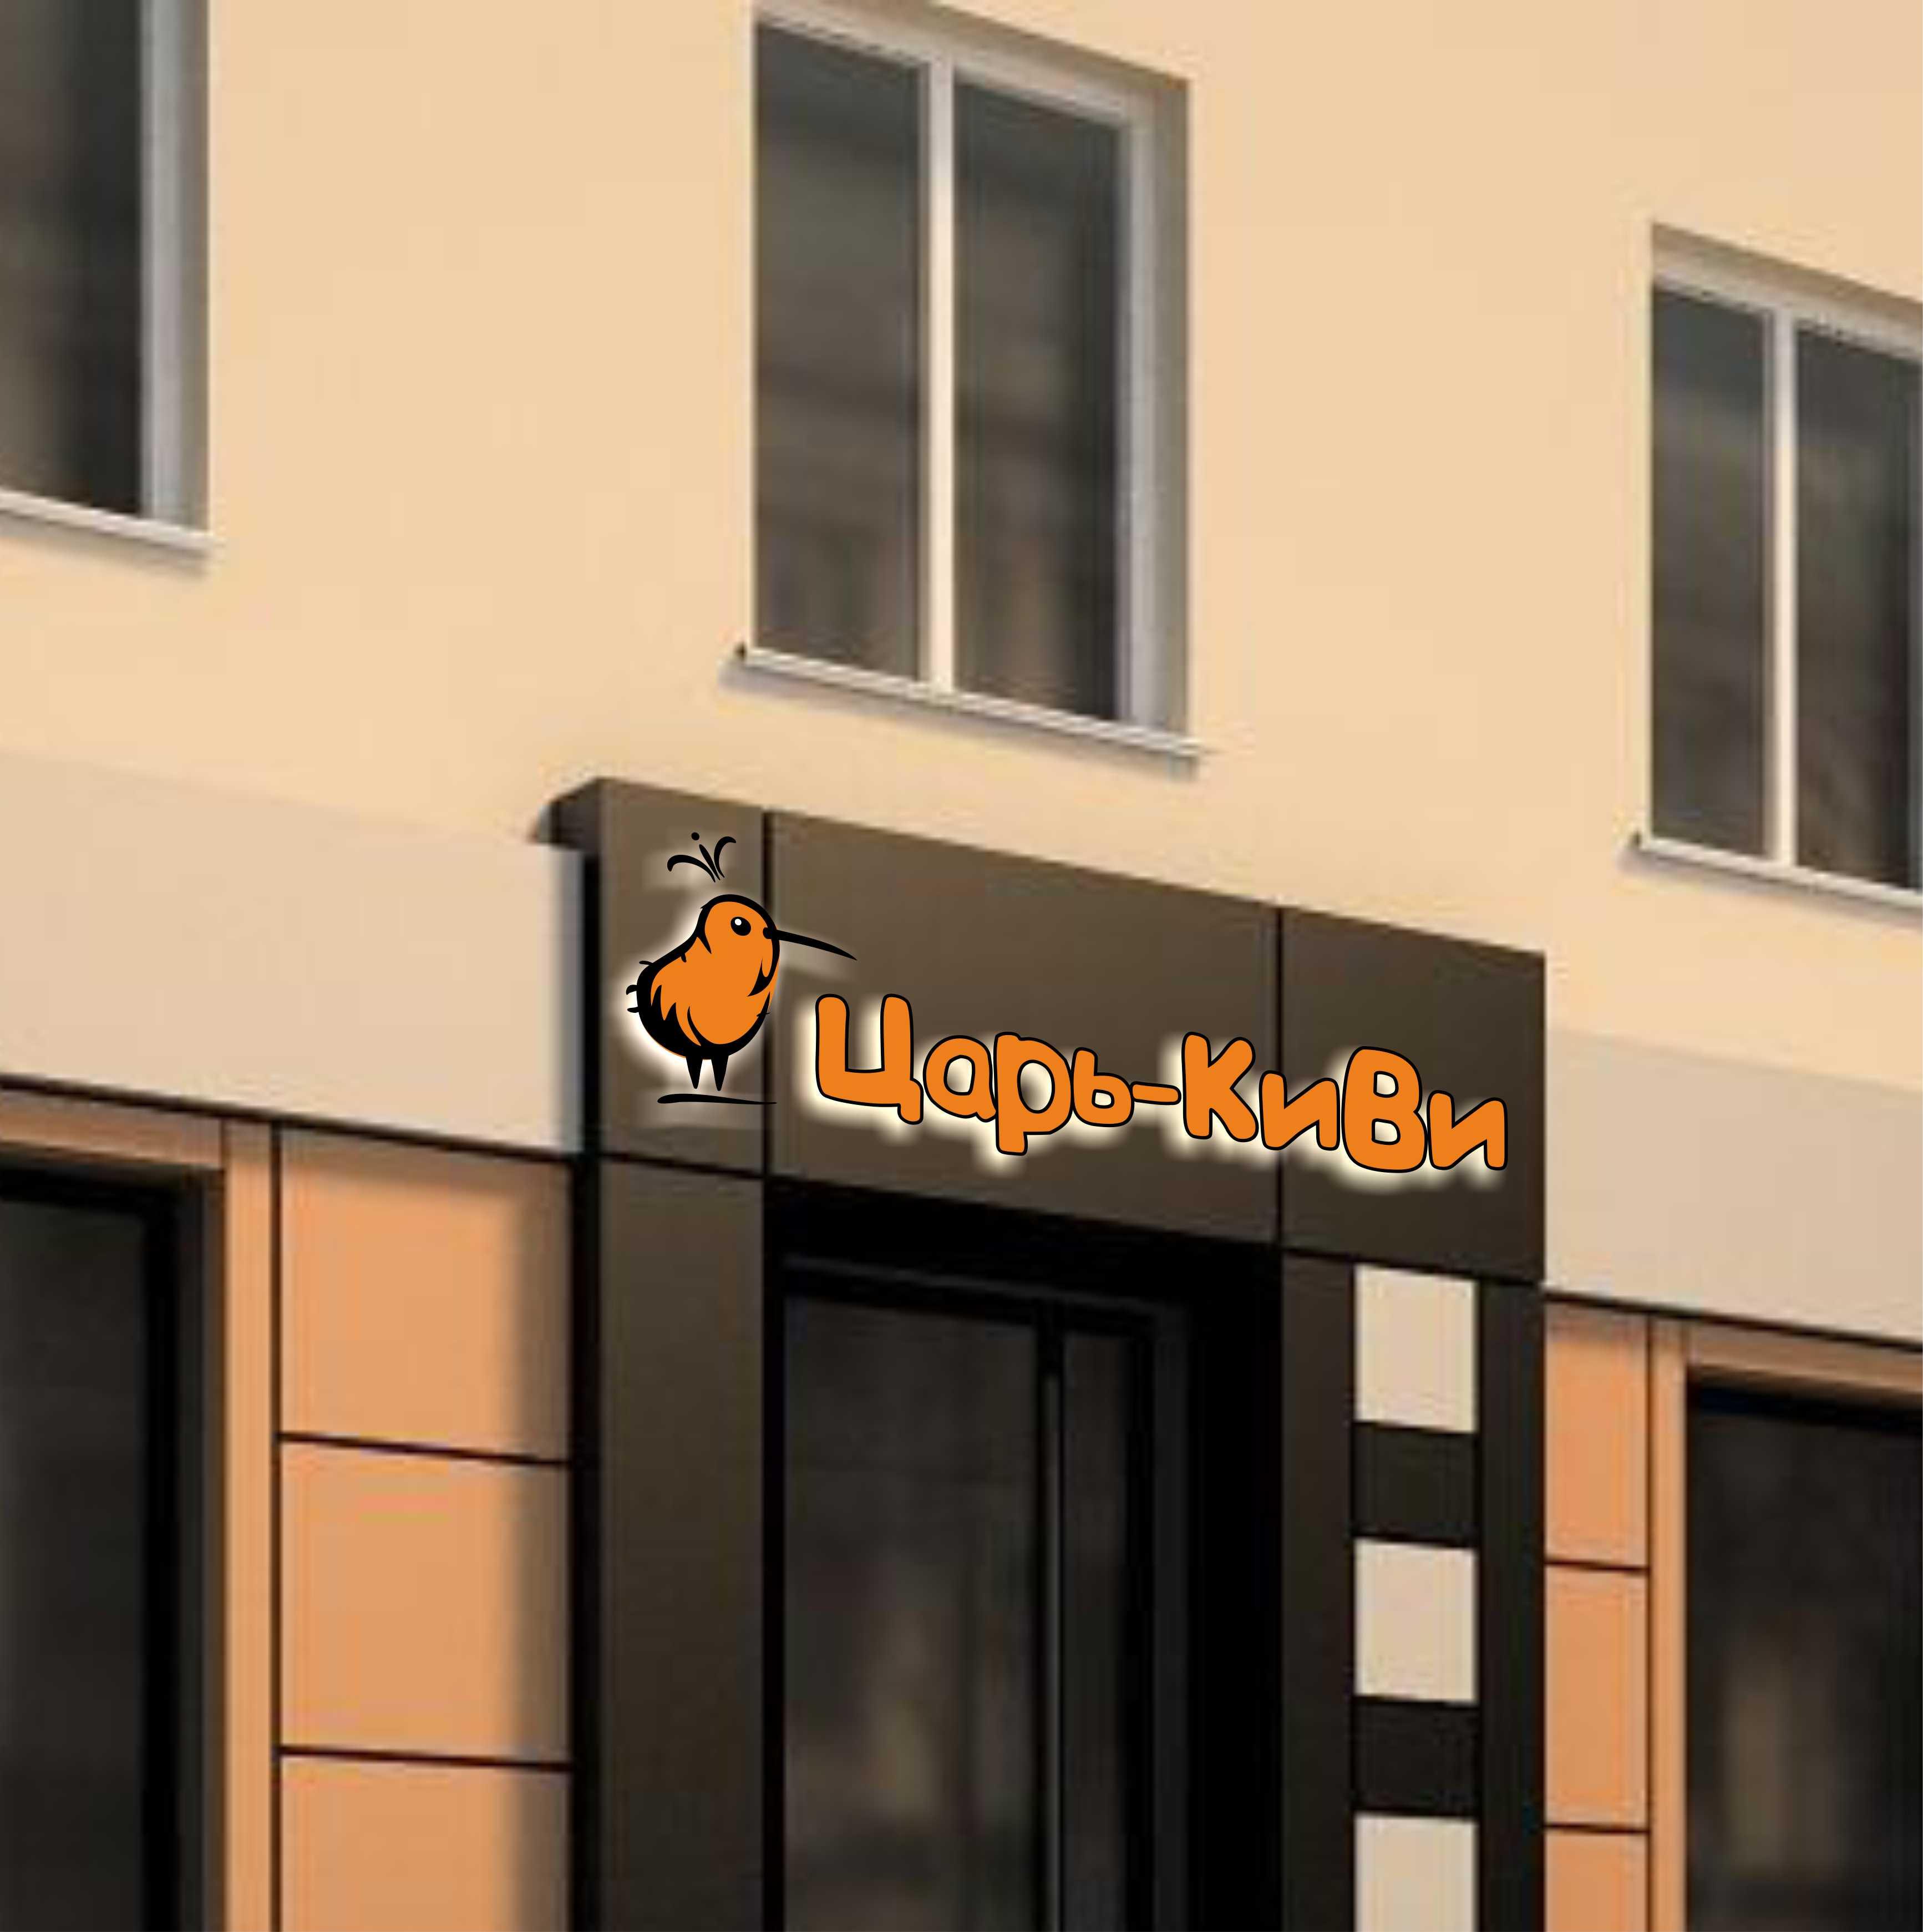 "Доработать дизайн логотипа кафе-кондитерской ""Царь-Киви"" фото f_4015a0321a05e05b.jpg"